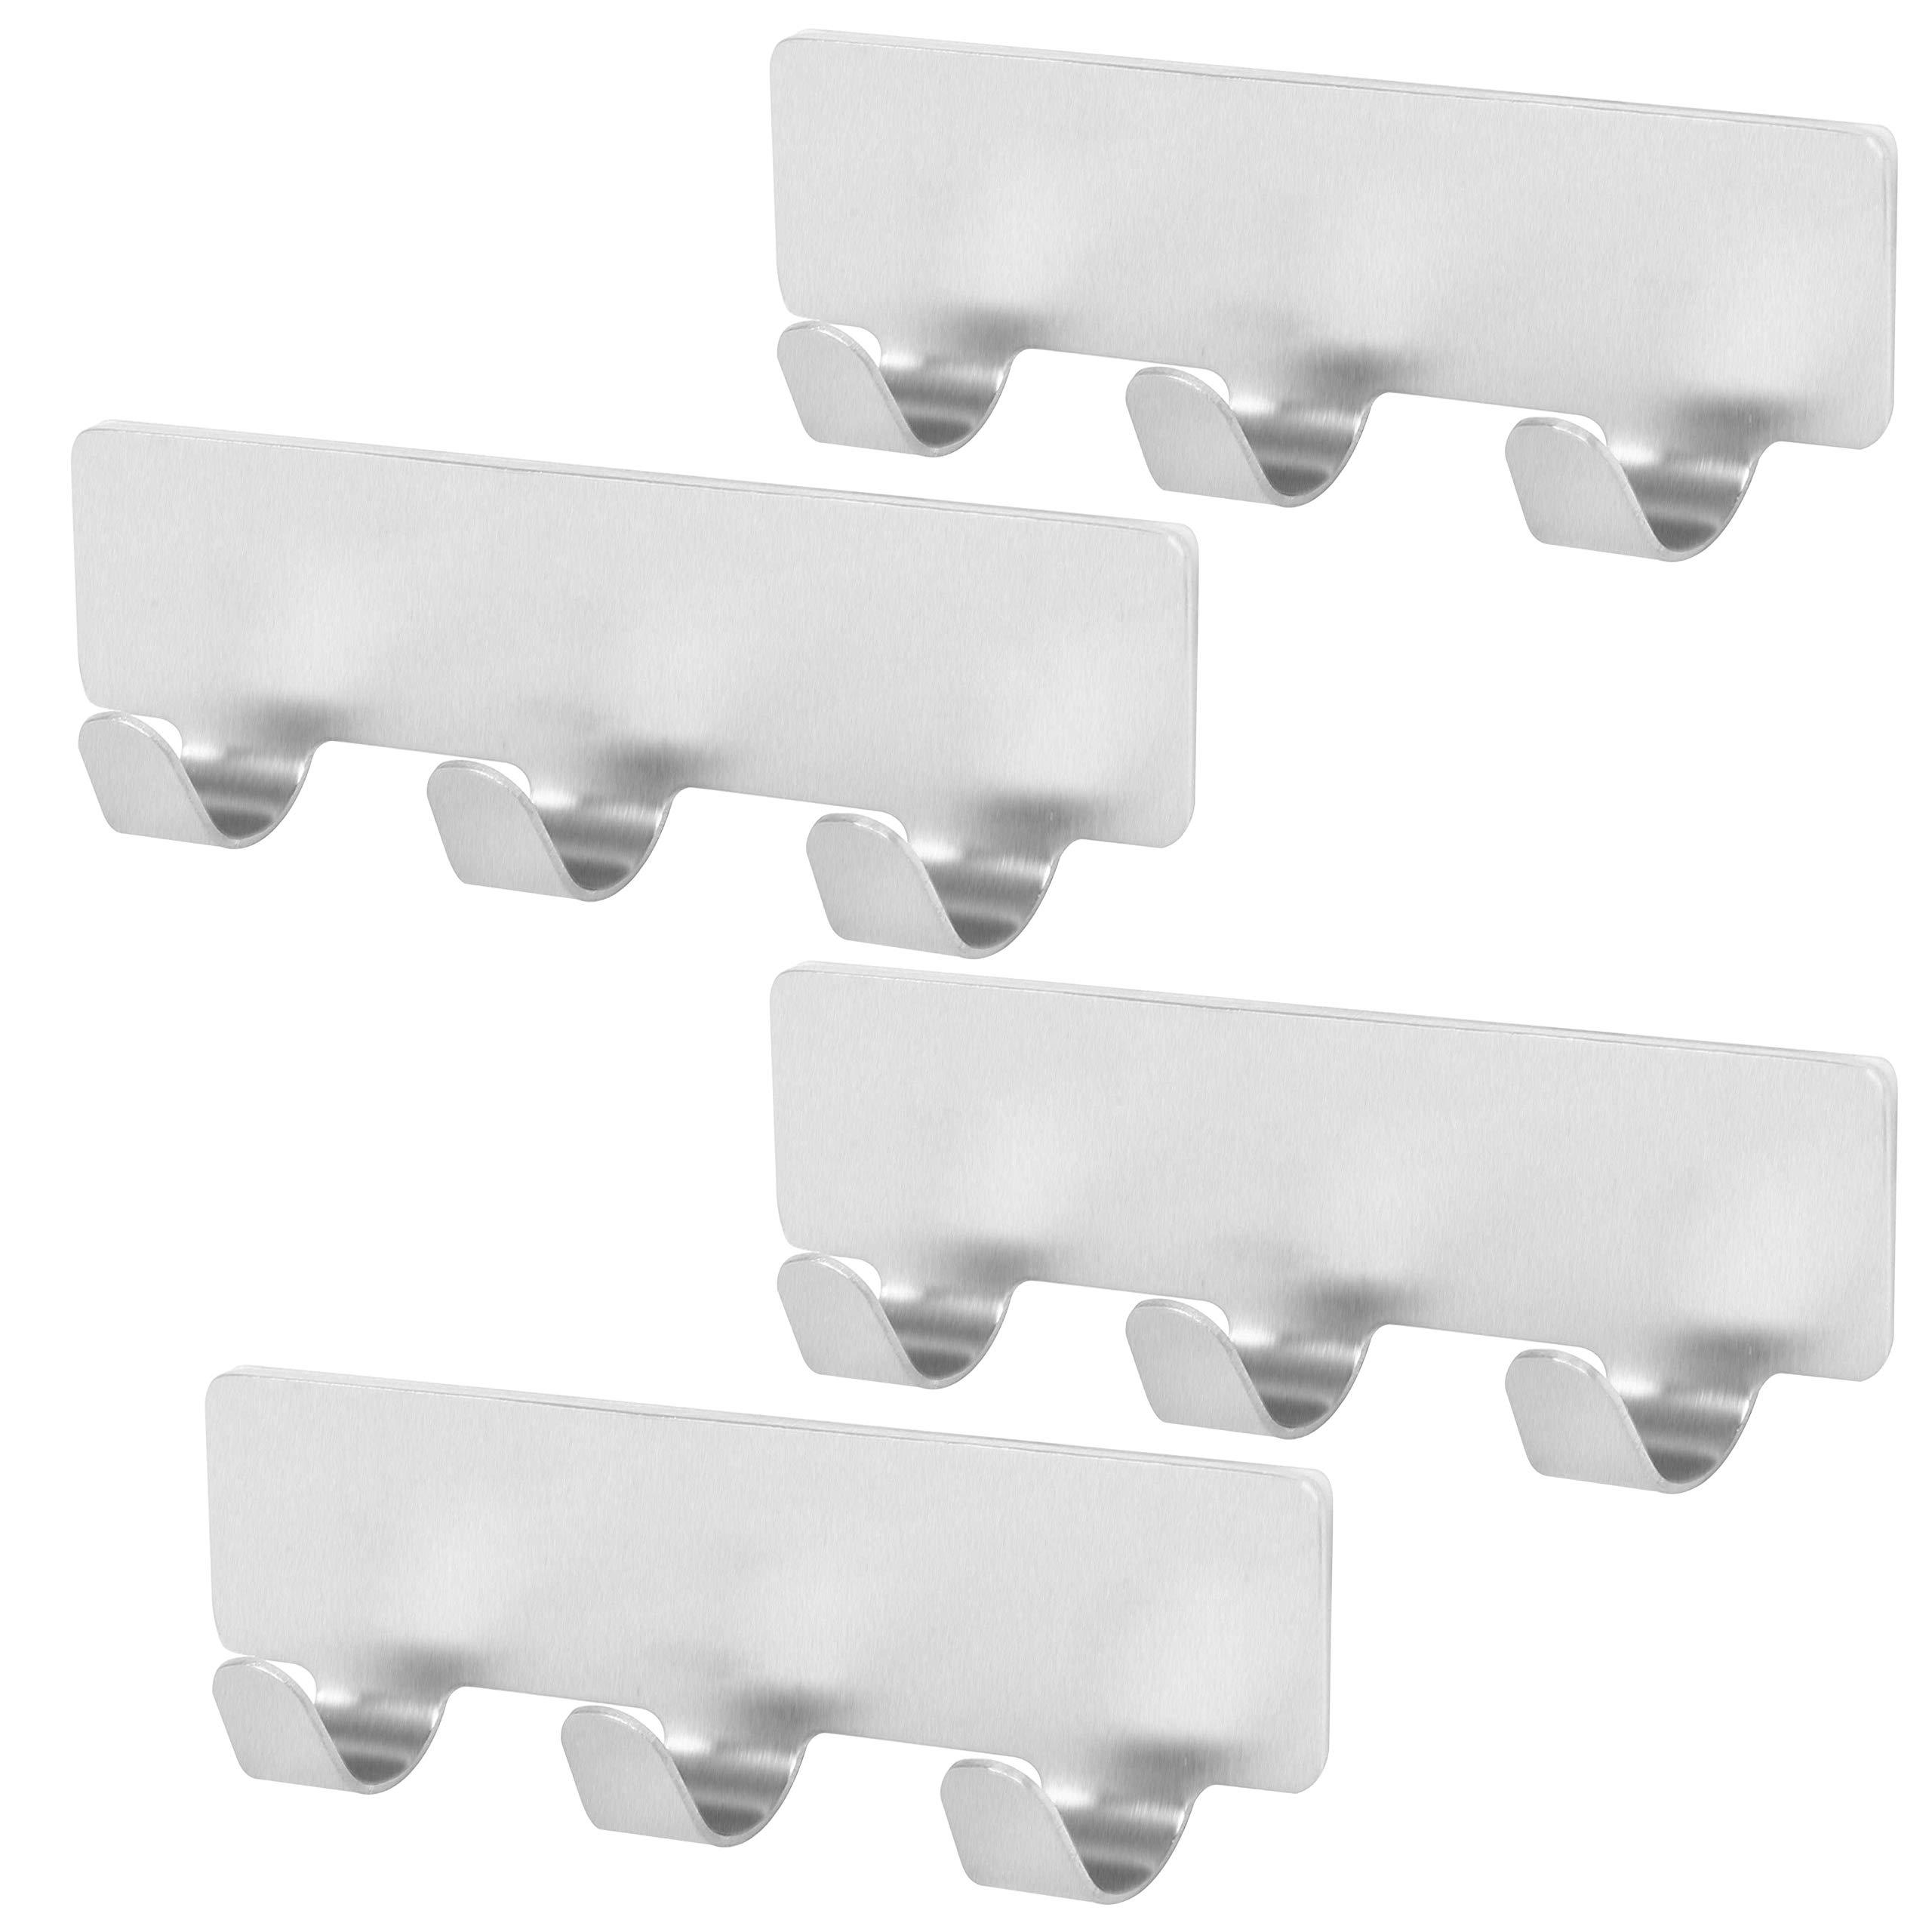 WEBI Adhesive Key Hooks Ultra-Strong, Rust-Resist, Waterproof, 3-Hook Utility Hook, Stick Wall Hanger Holder for Keys, Clothes, Towel, Hats, Scarves, Purse - Stainless Steel, Satin, 4 Packs (TG03-4)